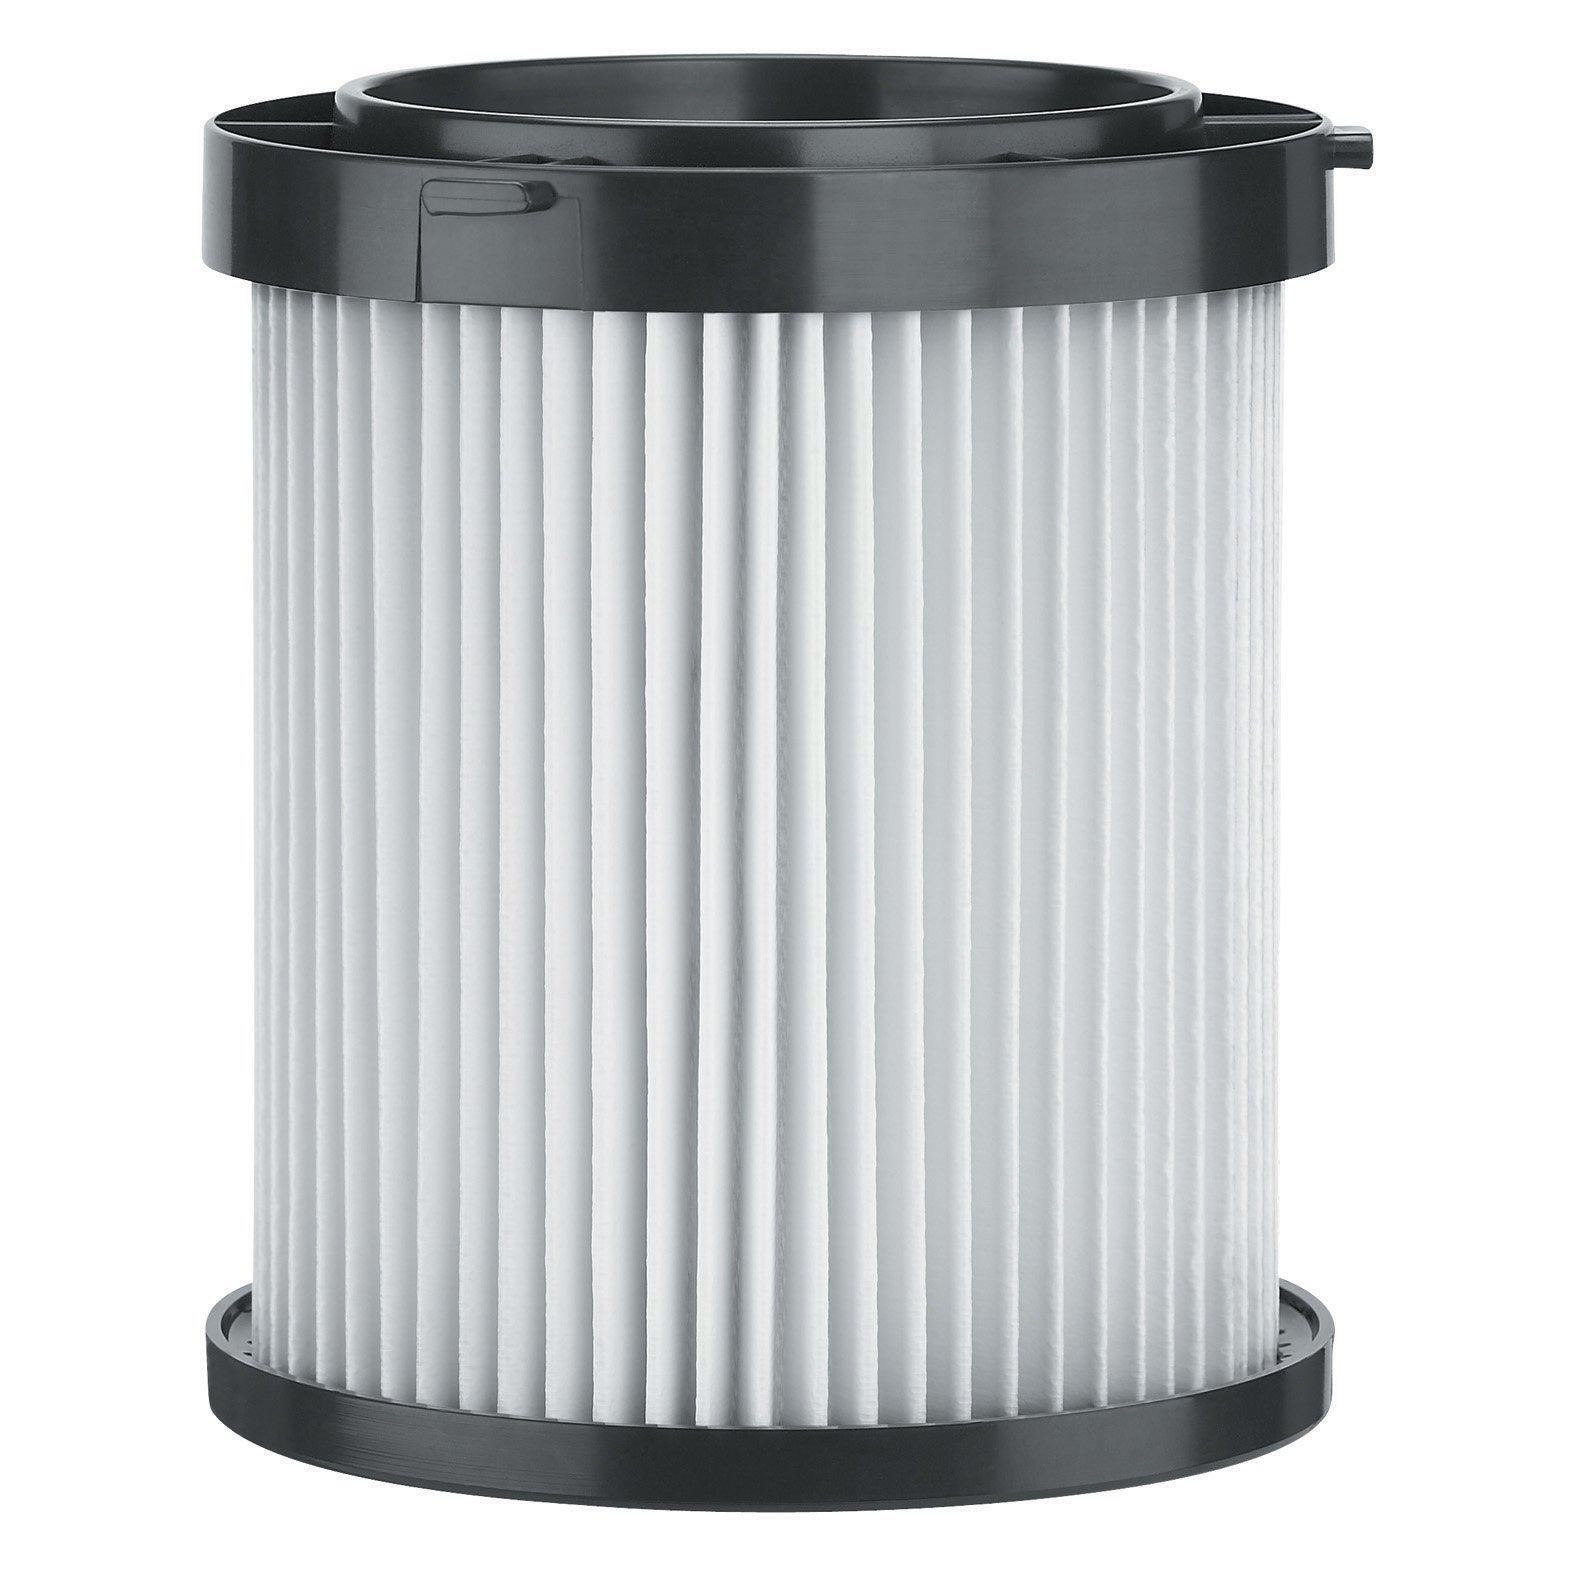 DEWALT DC5001 Replacement Filter for DC500 Vacuum by DEWALT (Image #1)